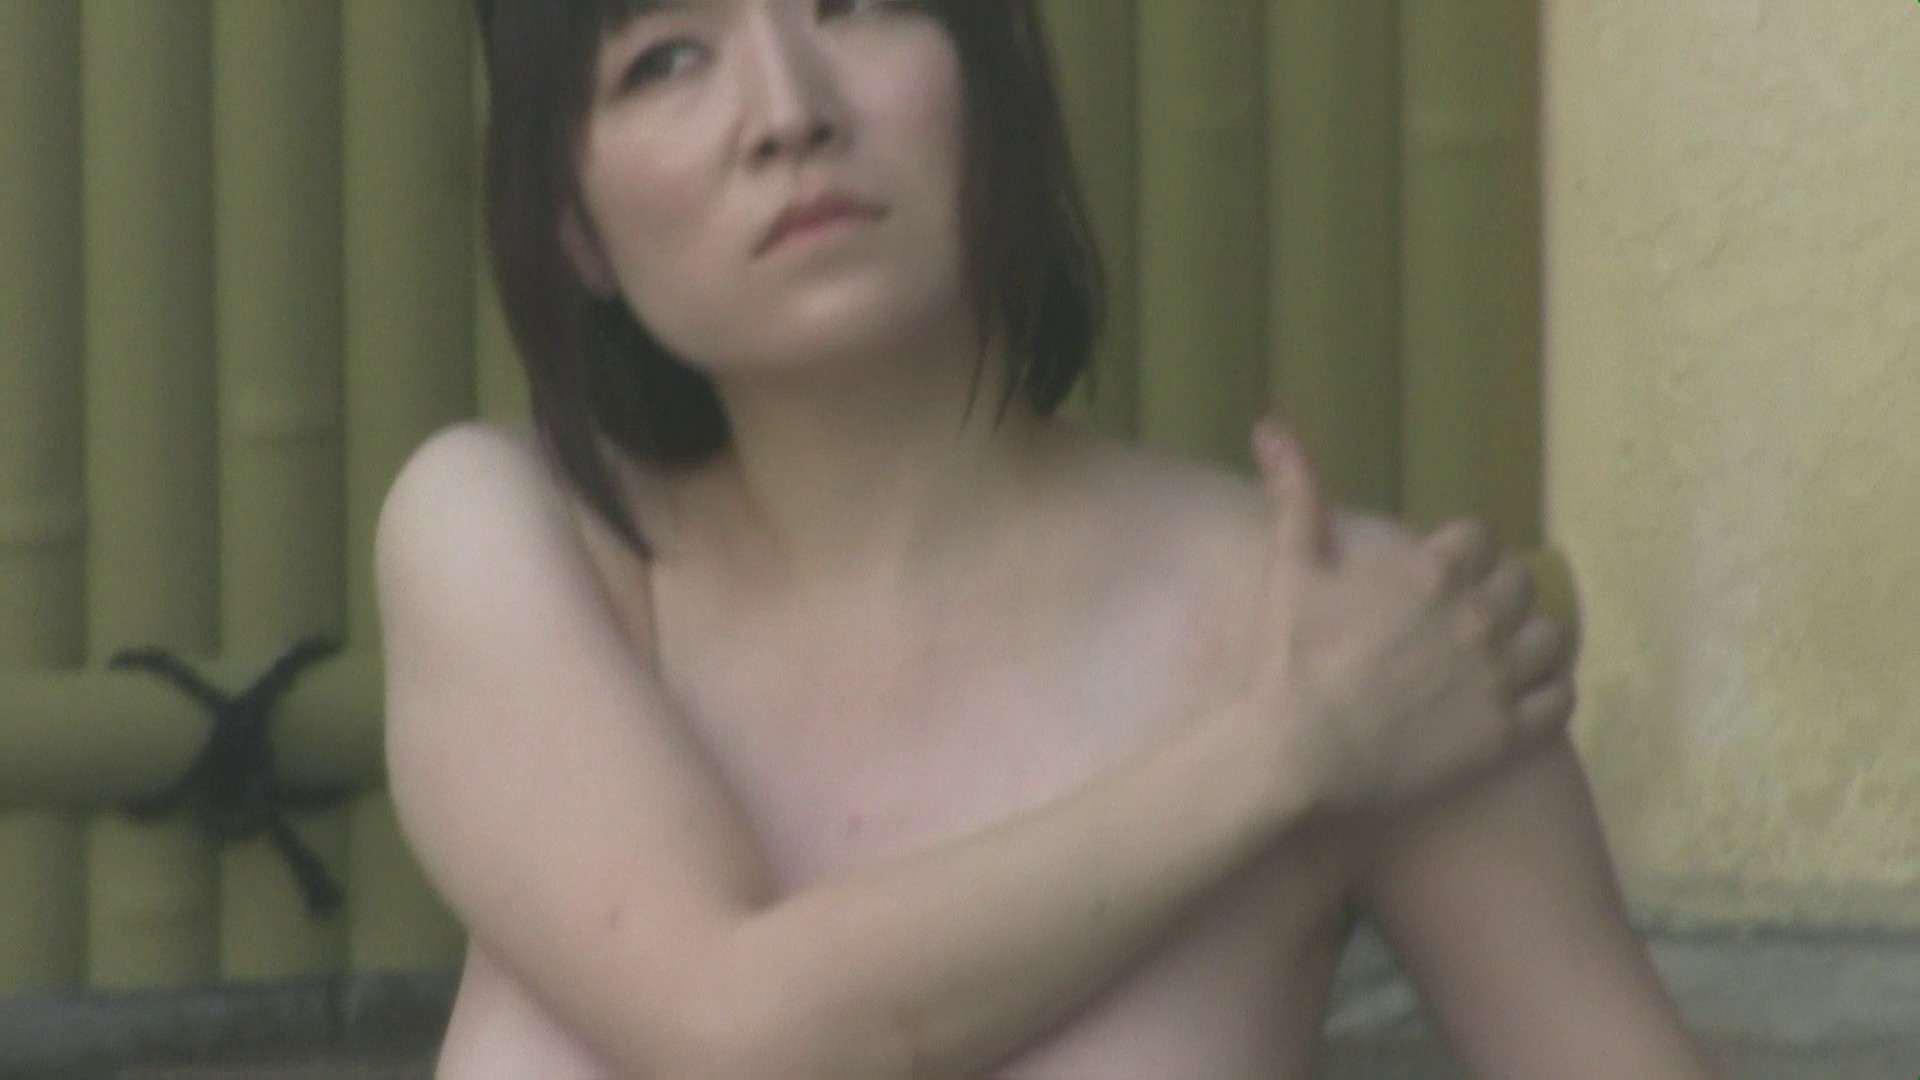 Aquaな露天風呂Vol.606 露天 スケベ動画紹介 110枚 65